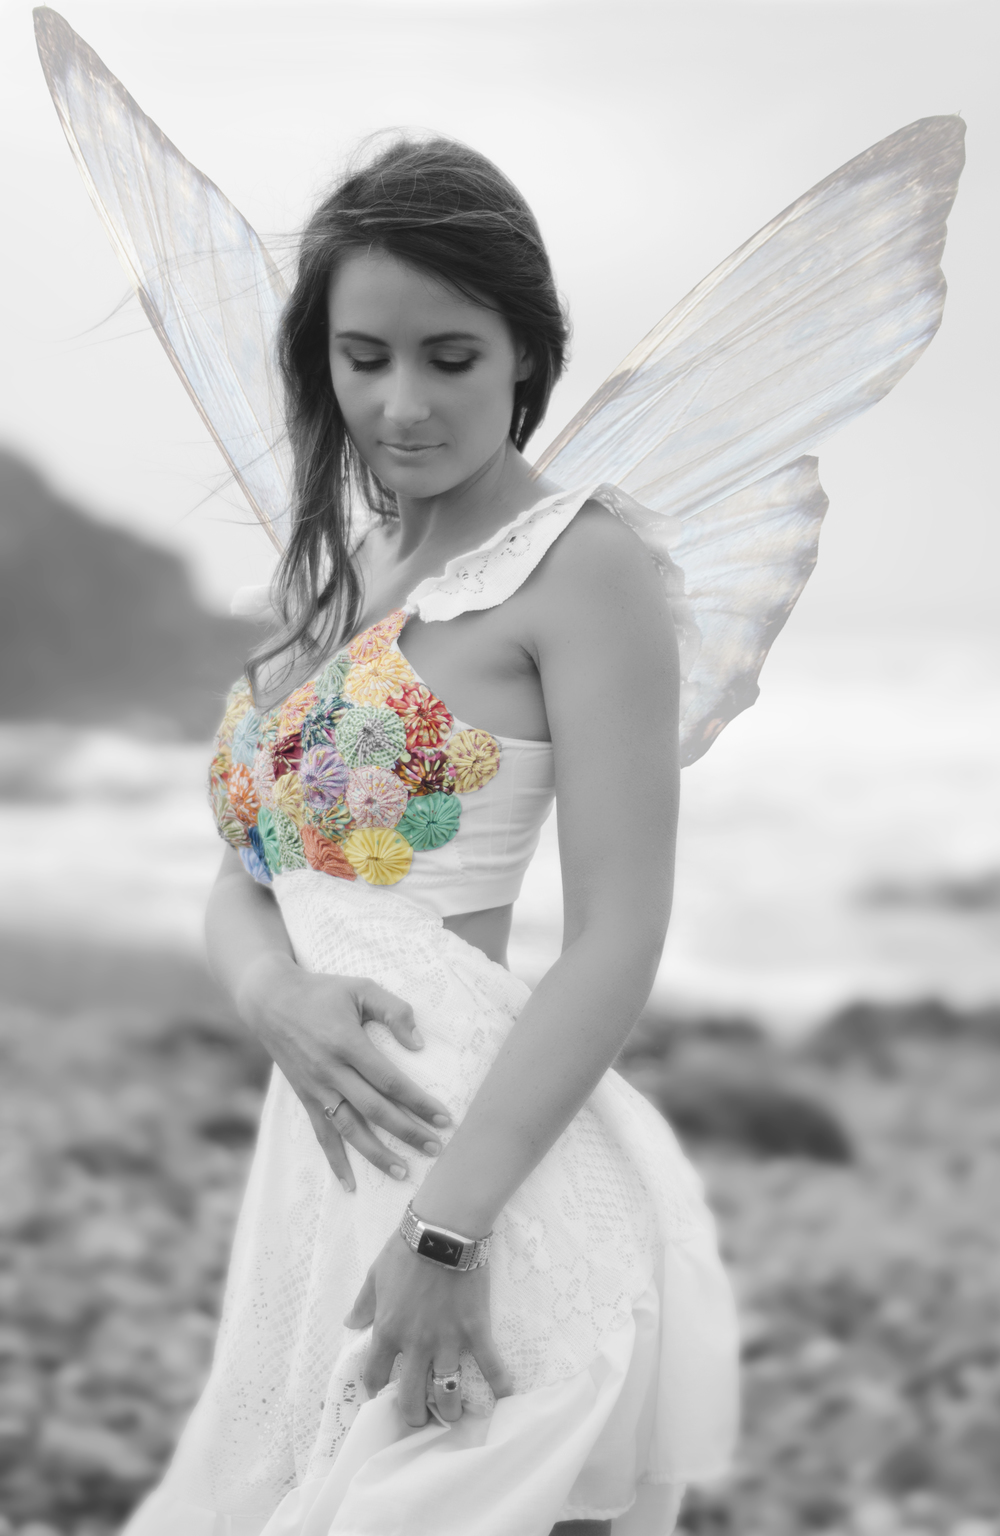 nikki butterfly.jpg